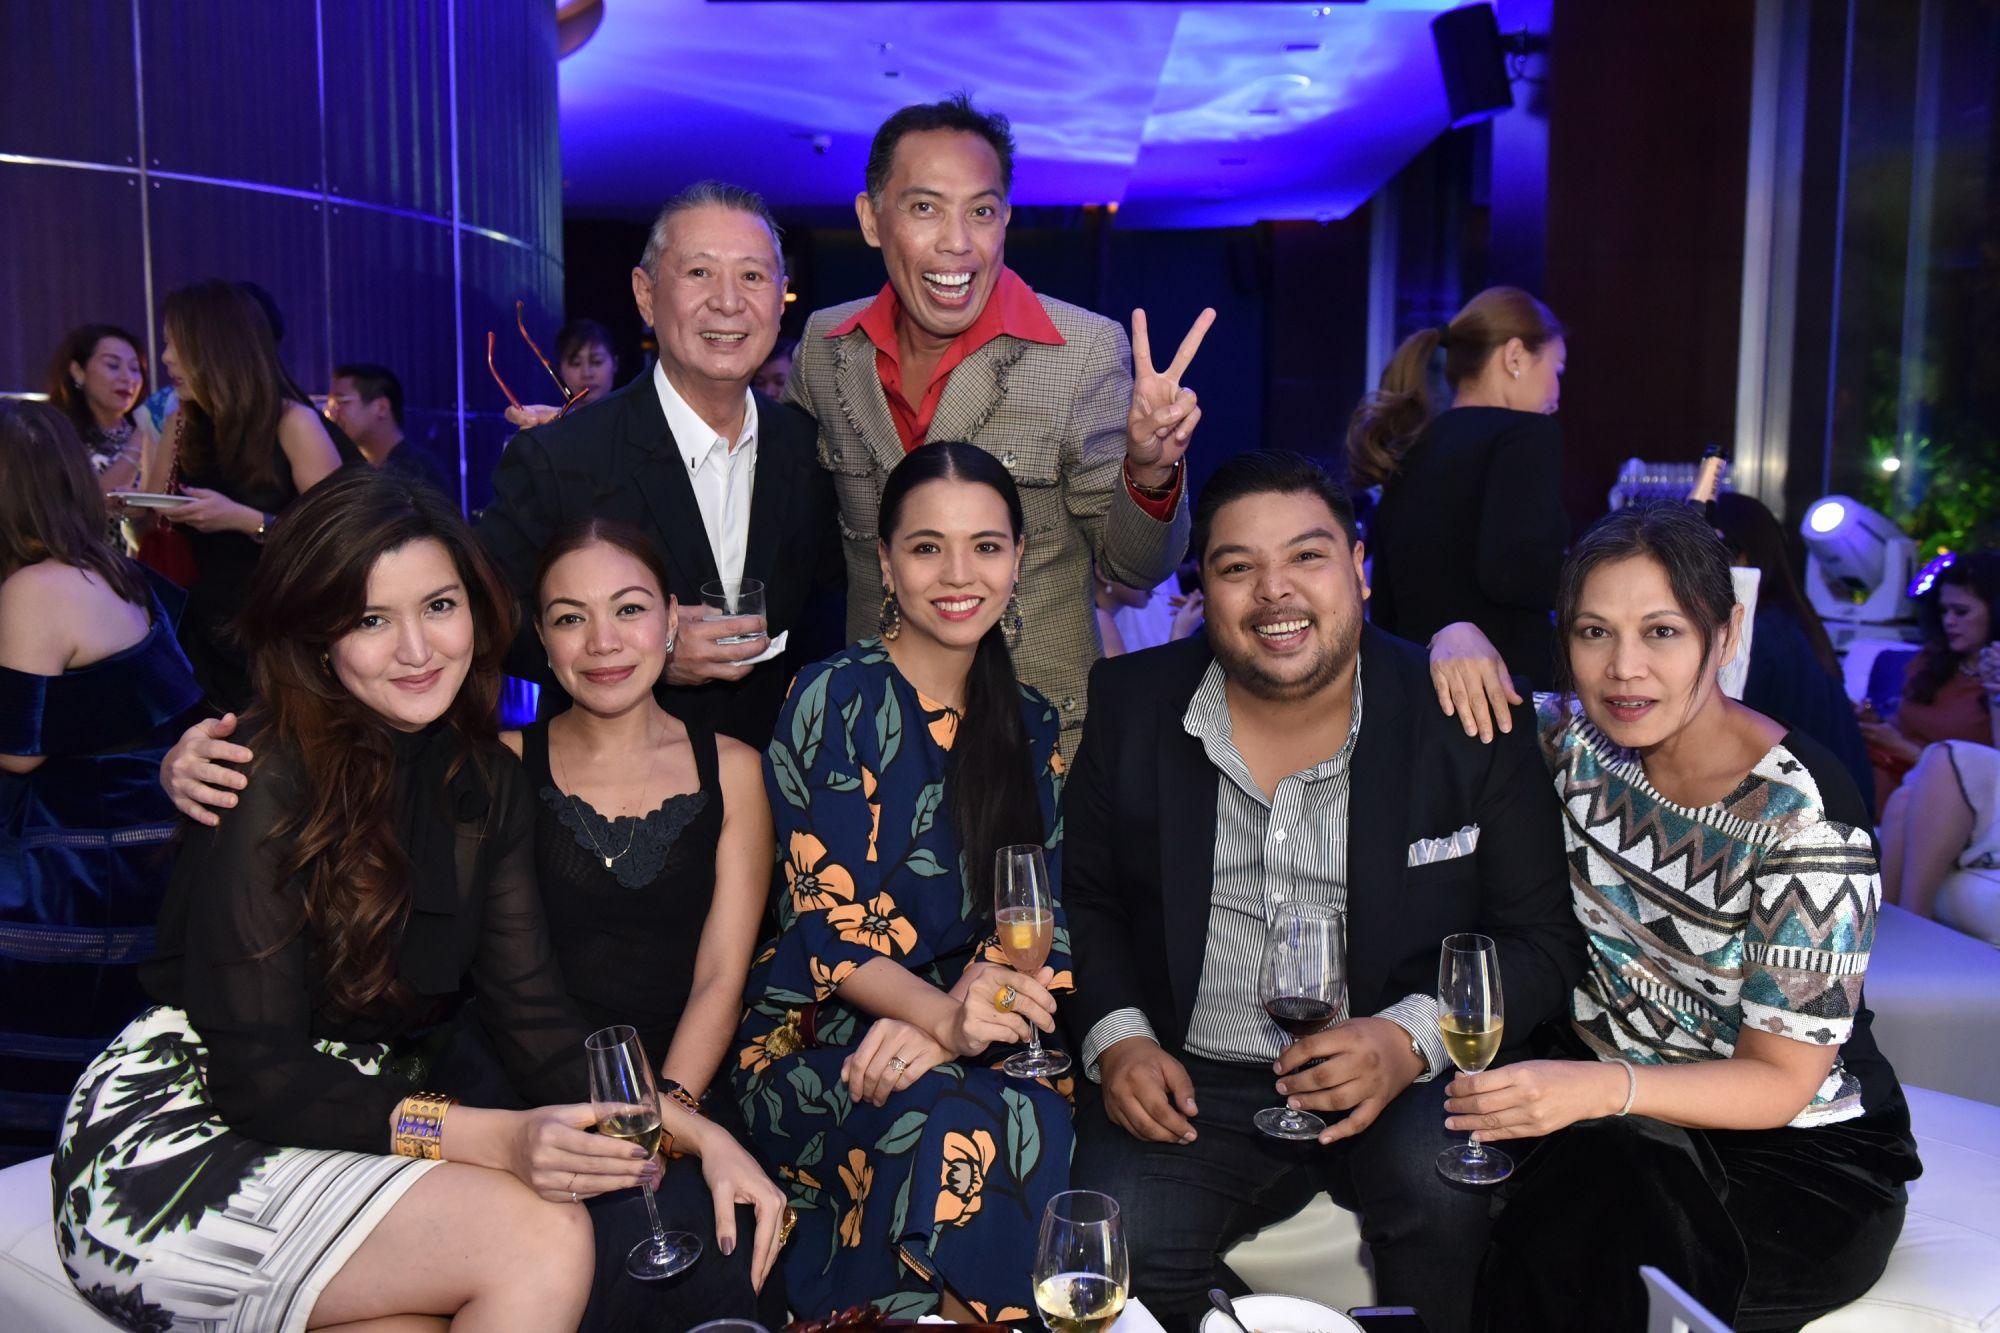 Mario Katigbak, Alex Vergara, Monique Madsen, Bianca Salonga, Ingrid Chua, Ram Bucoy